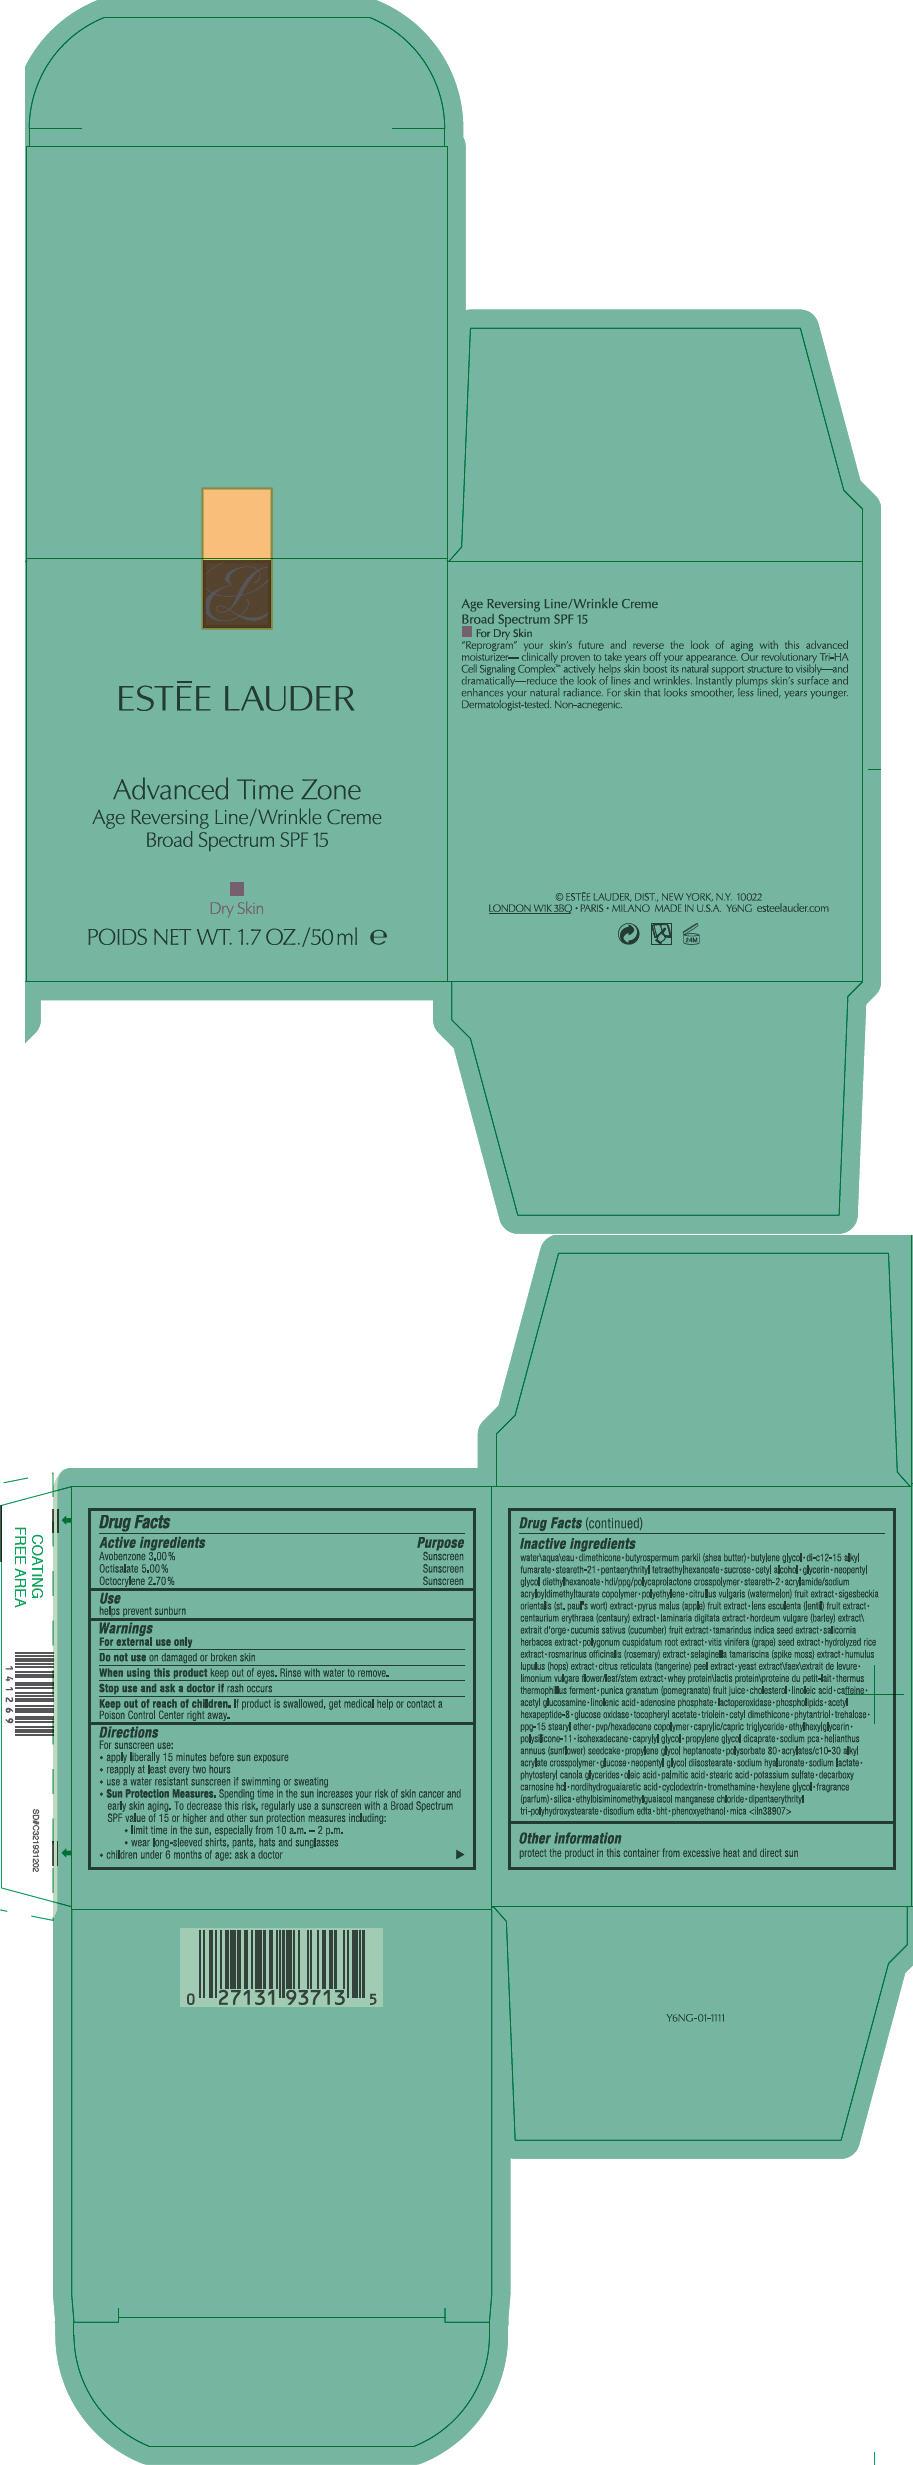 Advanced Time Zone Age Reversing Line Wrinkle Broad Spectrum Spf 15 Dry Skin (Avobenzone, Octisalate, And Octocrylene) Cream [Estee Lauder Inc]